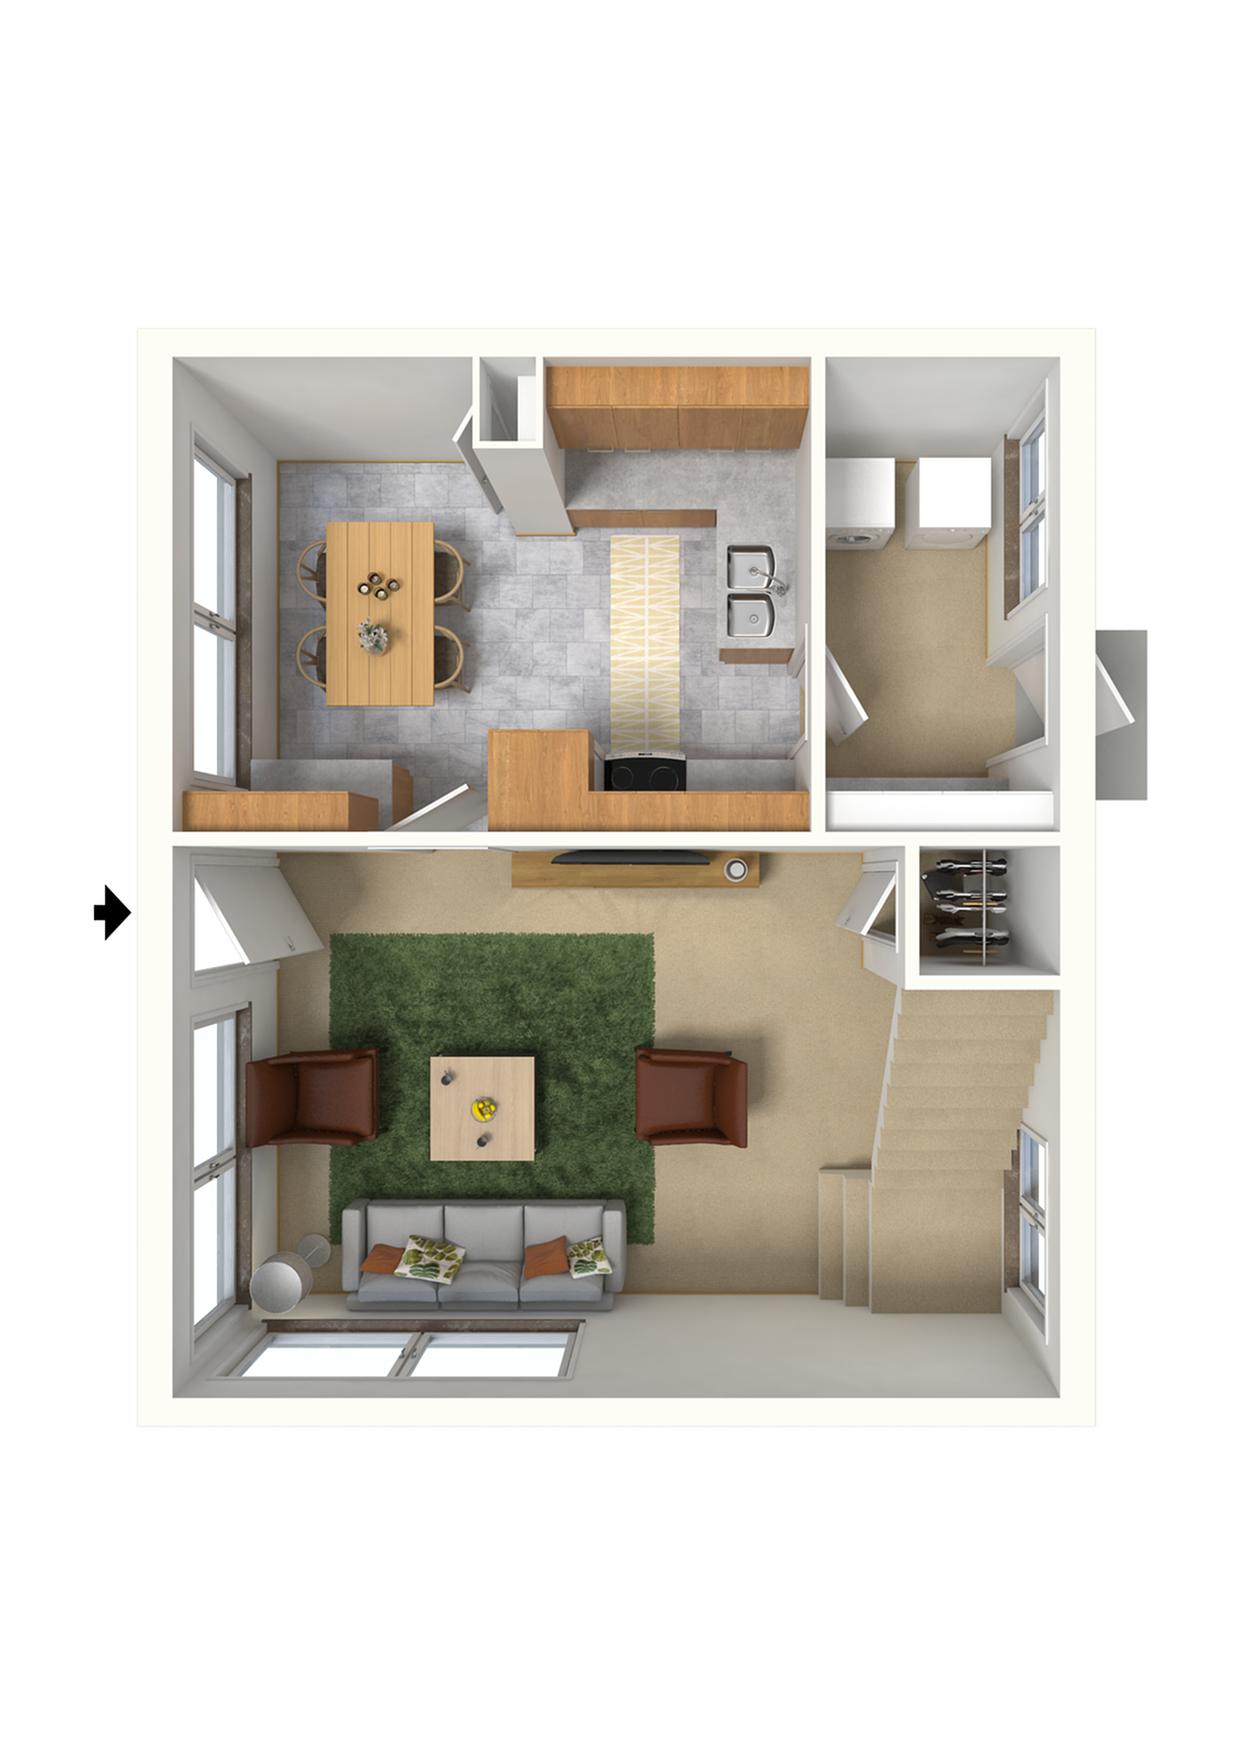 2 Bedroom Apartment Floor Plan | Hickam Air Force Base Housing | Hickam Communities